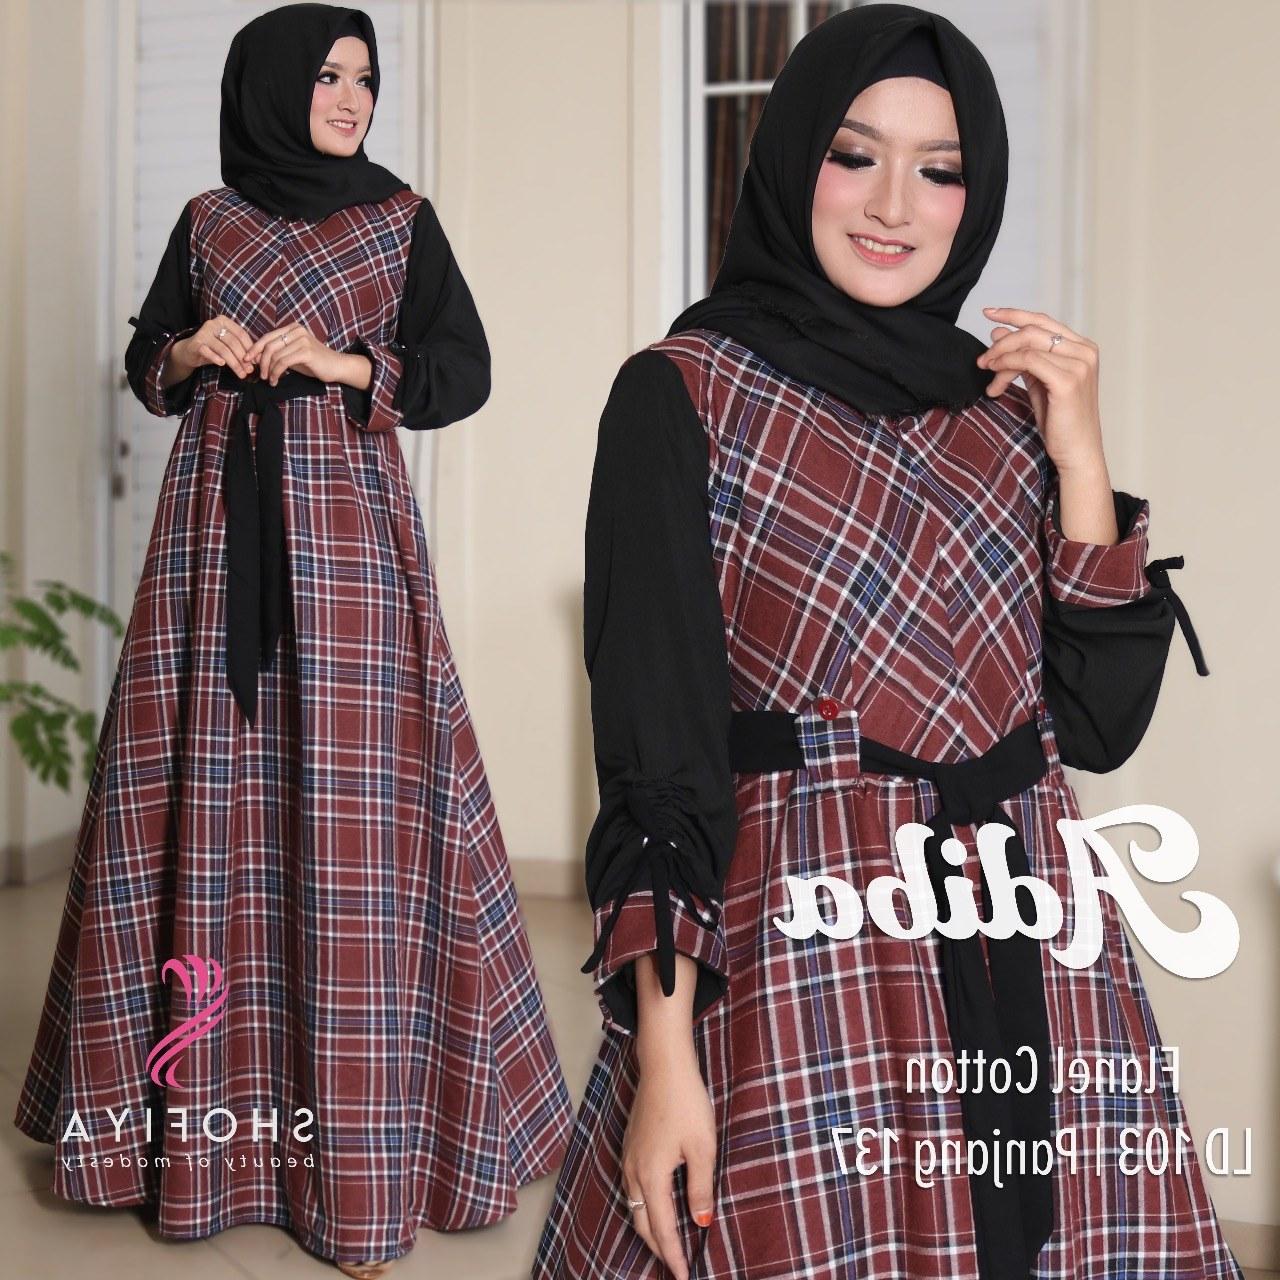 Bentuk Model Baju Lebaran Modern Mndw Baju Gamis Terbaru Lebaran Wa 0811 5131 482